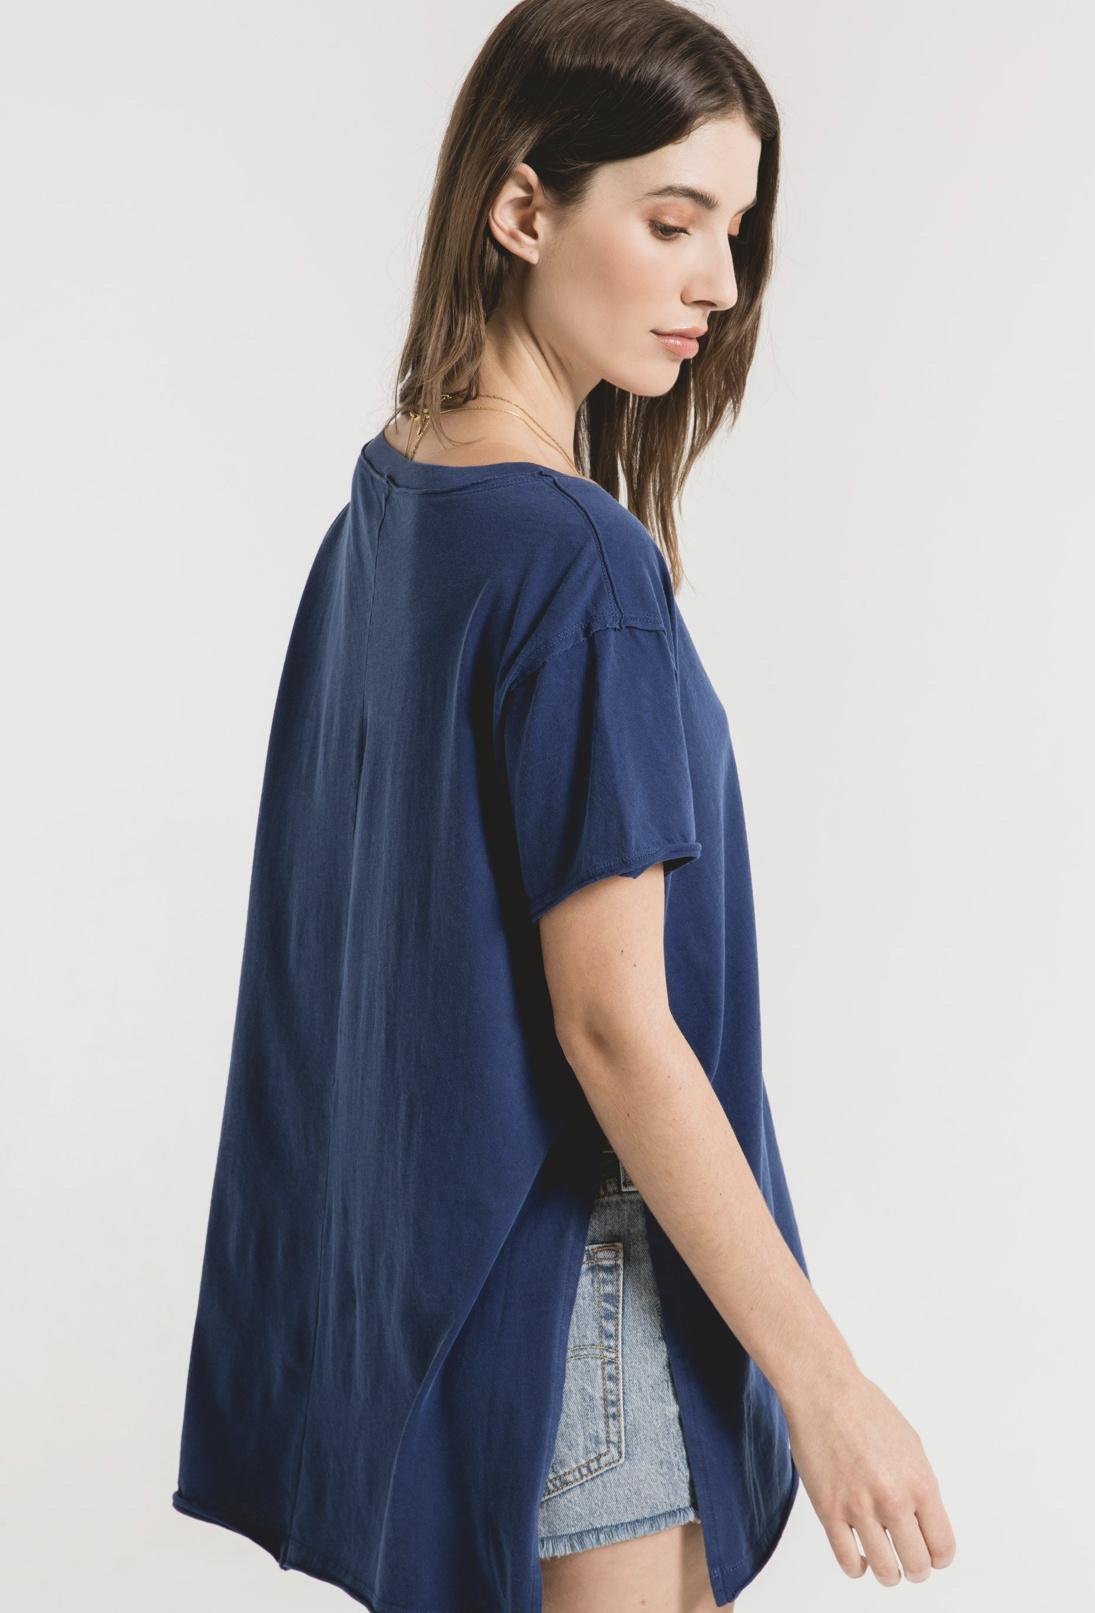 Z Supply Organic Cotton Side Slit Tunic